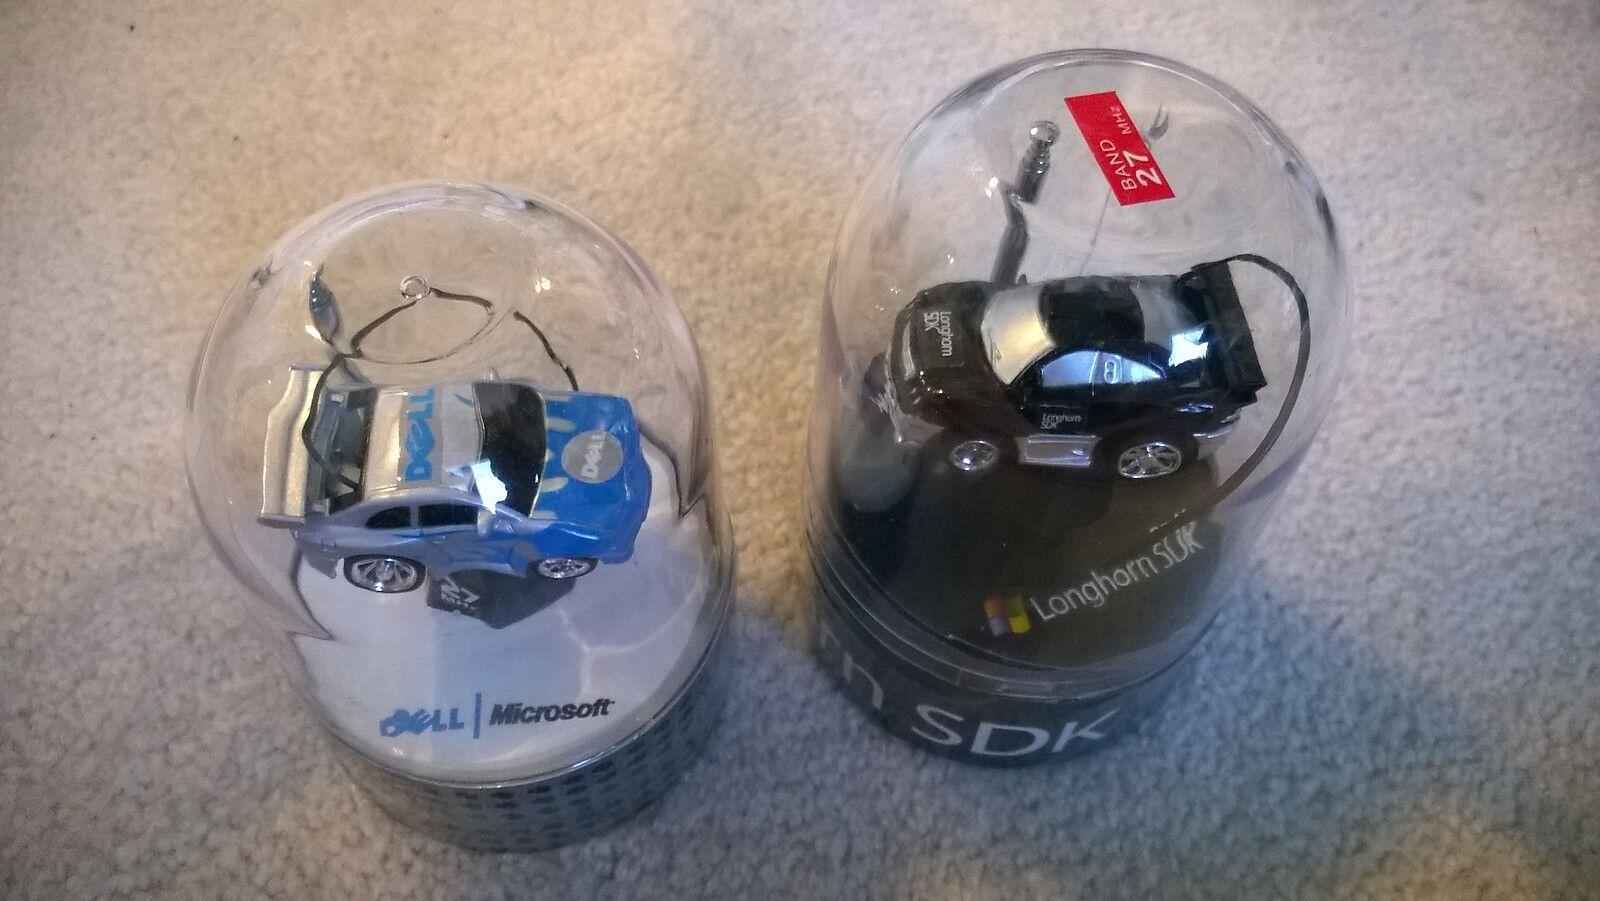 NEW -  2 HO scale Radio Control Cars - dell - Microsoft promotion - EA0-9000